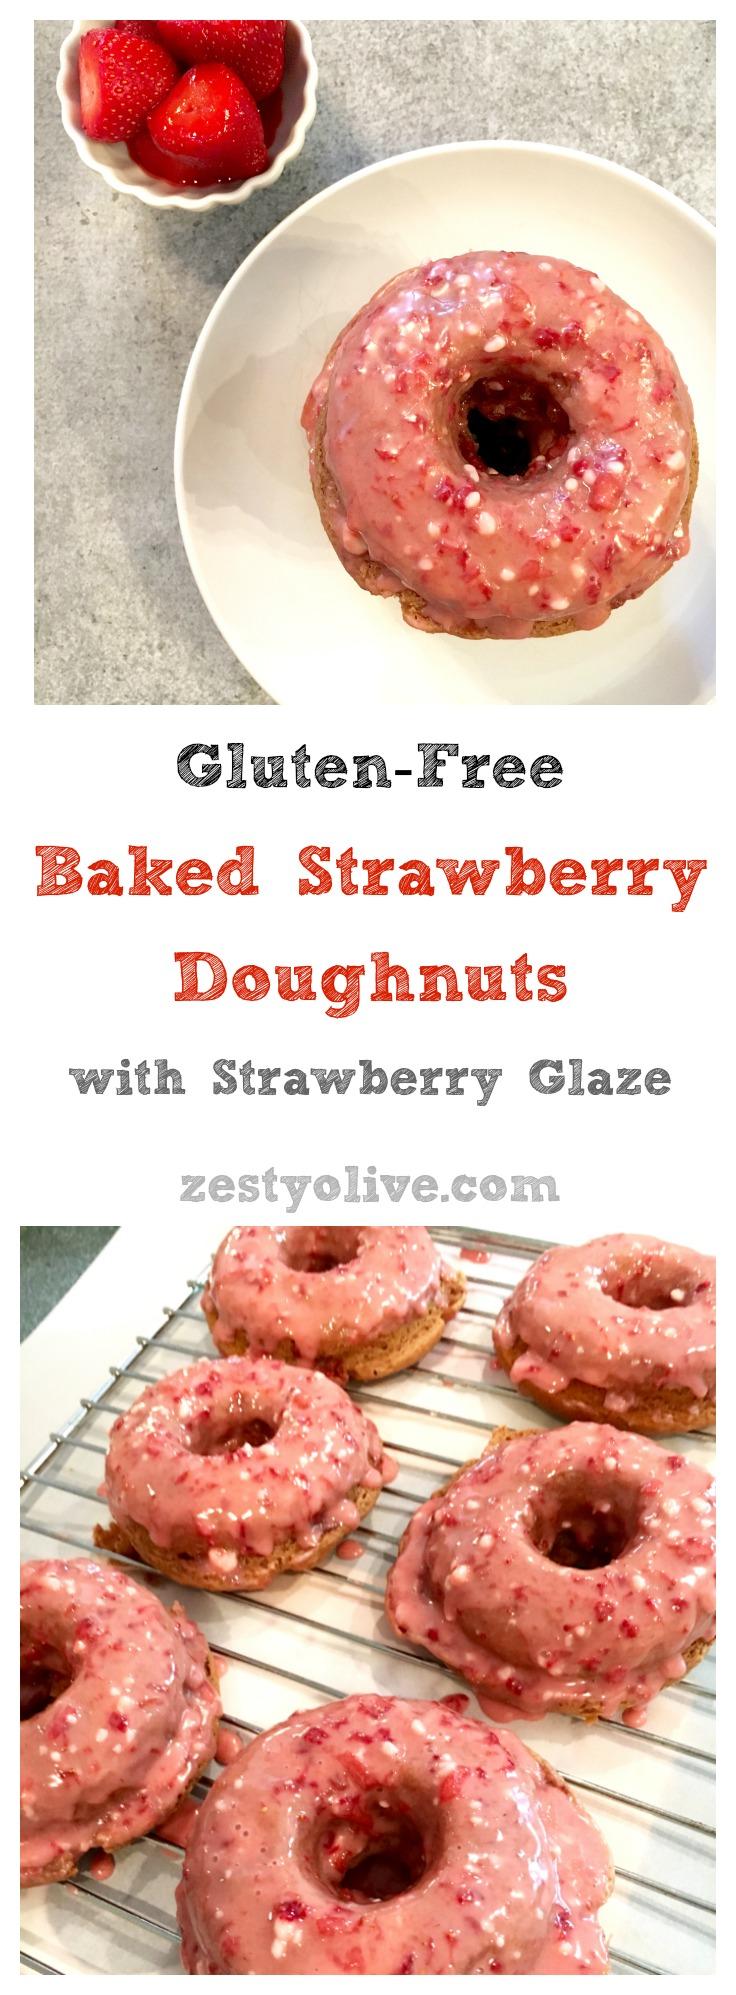 Gluten Free Baked Strawberry Doughnuts